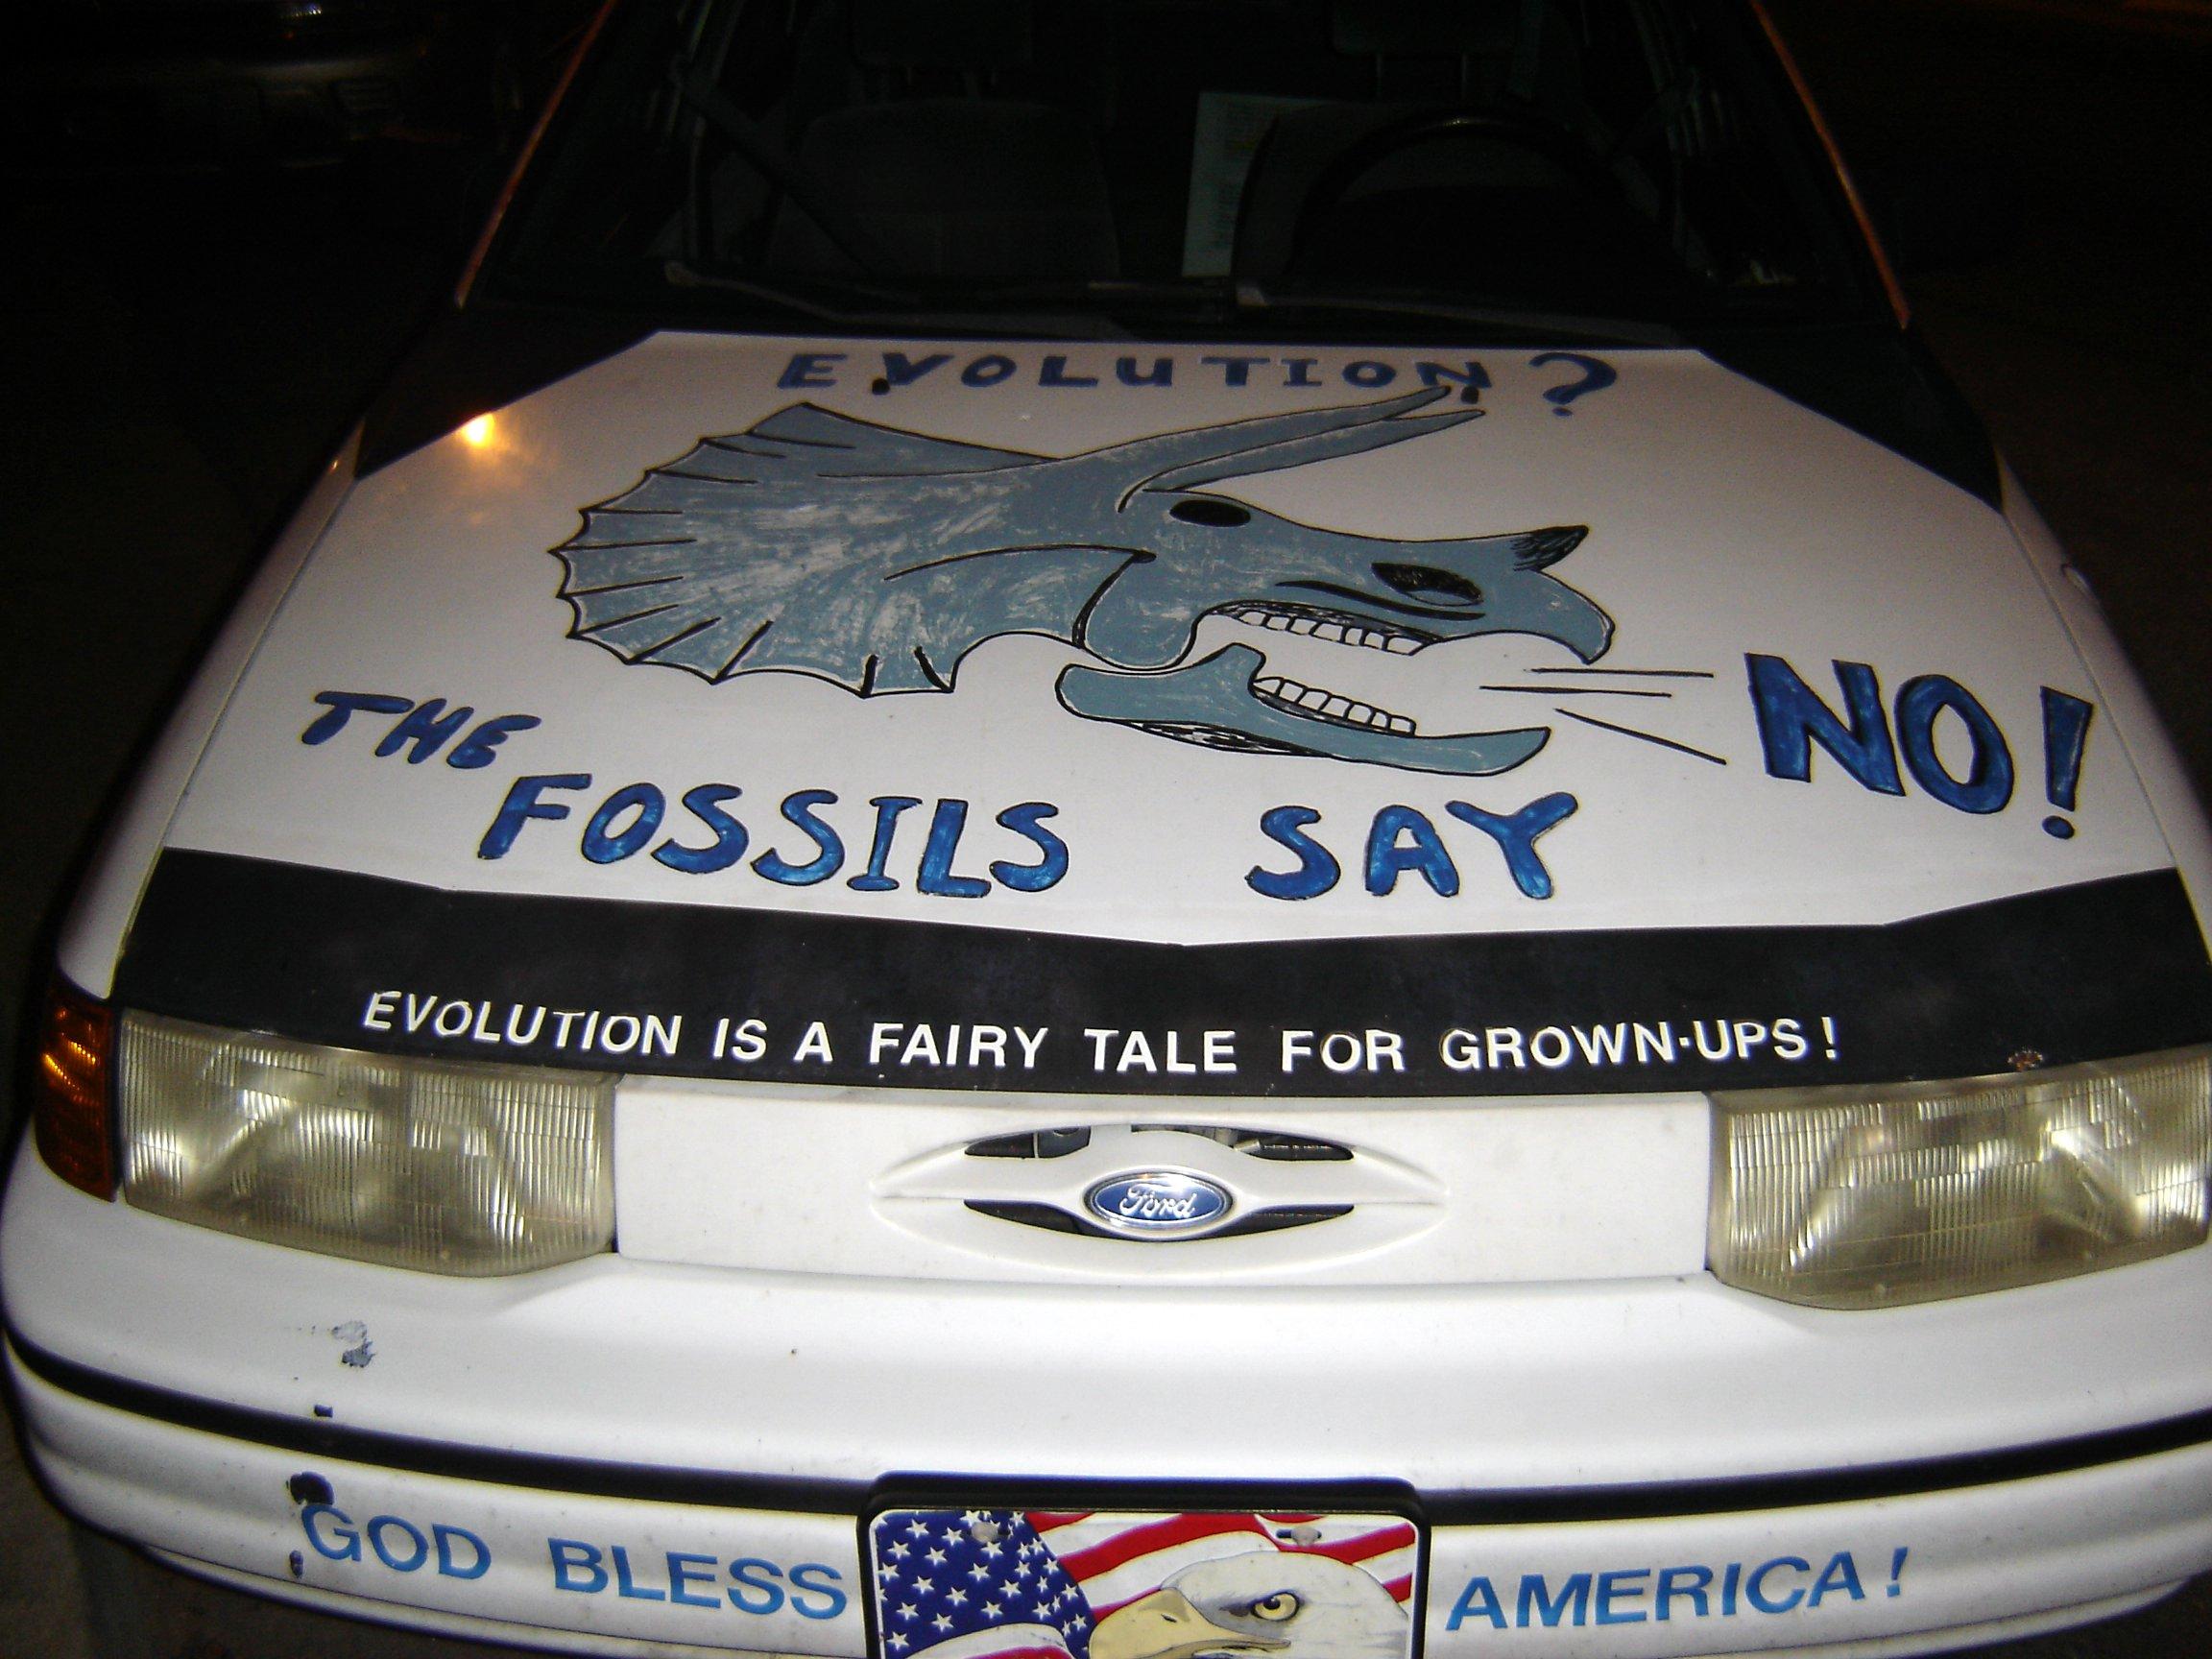 Typical republican American car! Creationist_car